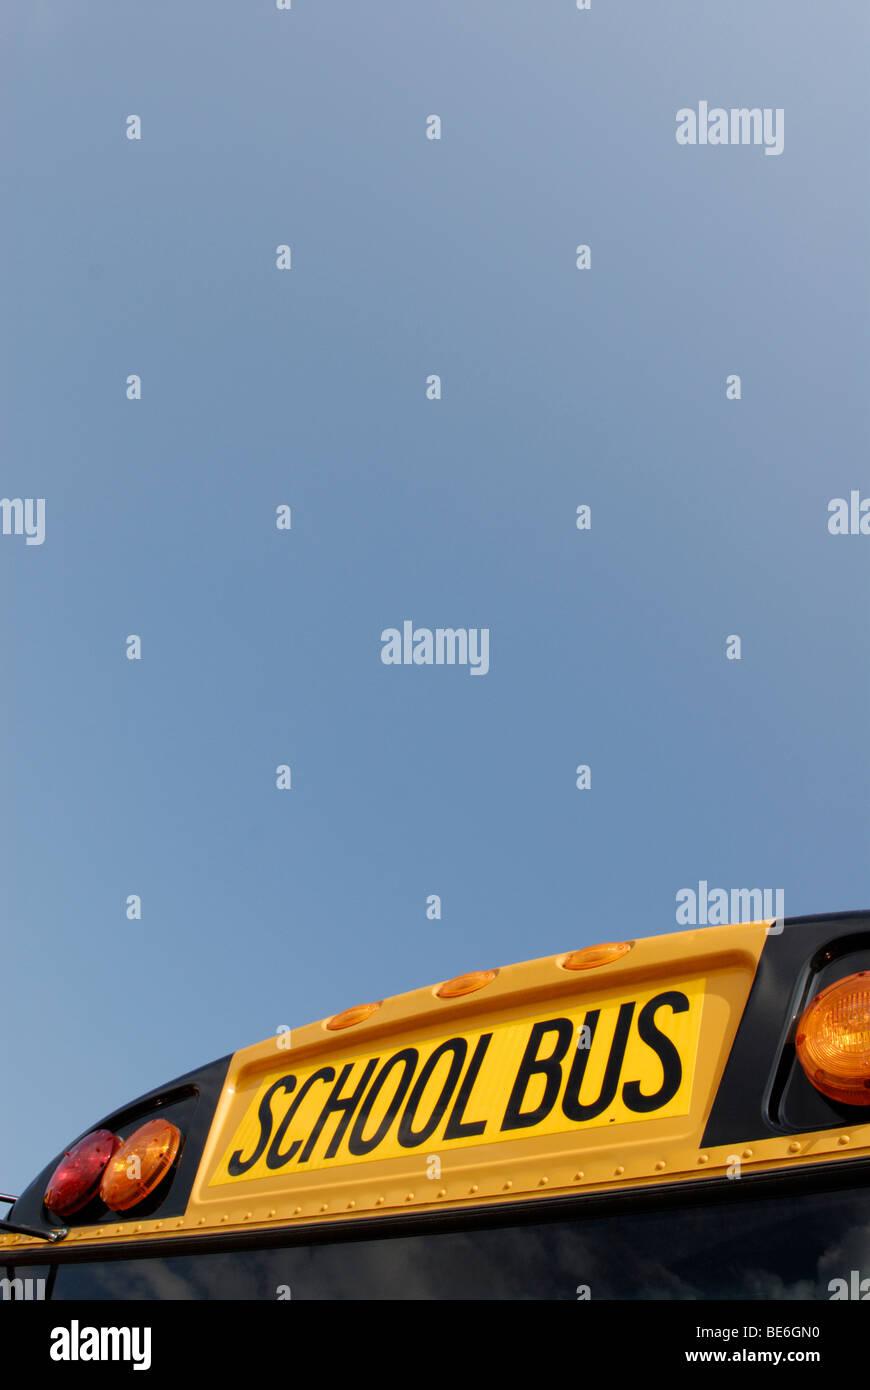 Autobús escolar Imagen De Stock